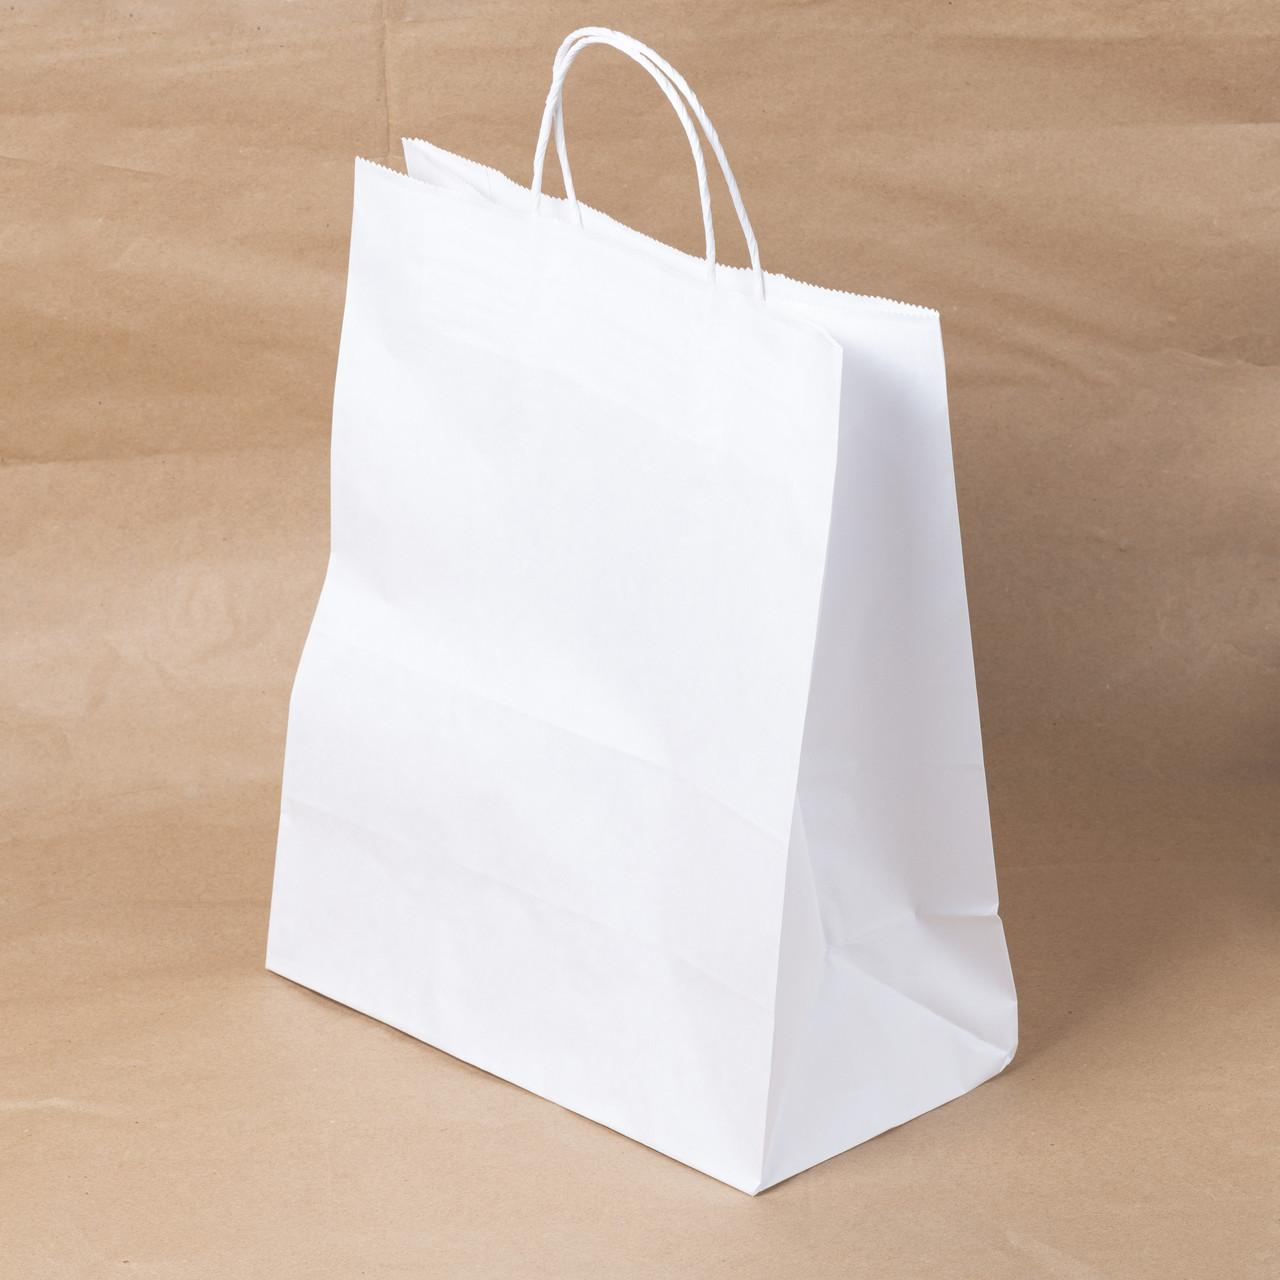 Пакет бумажный белый с крученными ручками 260х150х350 мм.